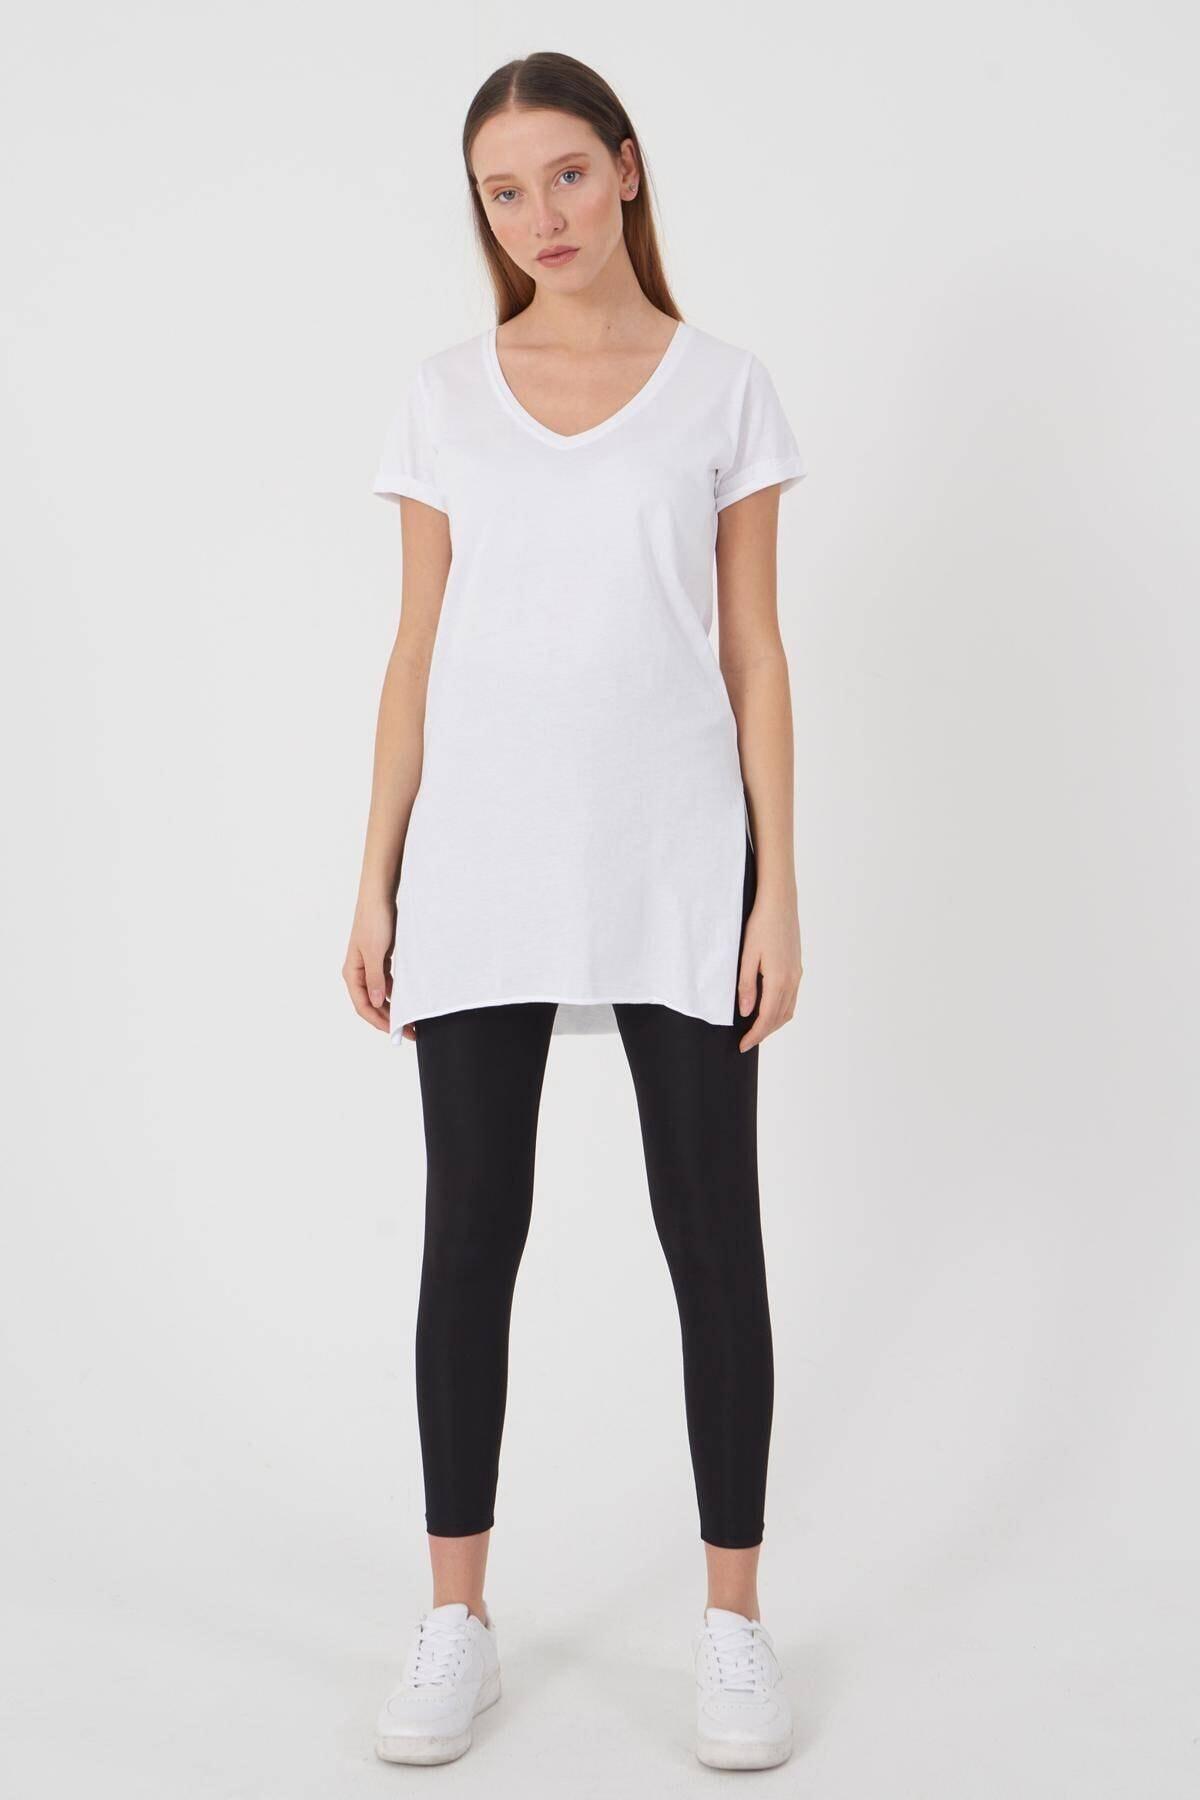 Addax Kadın Beyaz V Yaka T-Shirt P0102 - U1 Adx-00007205 0